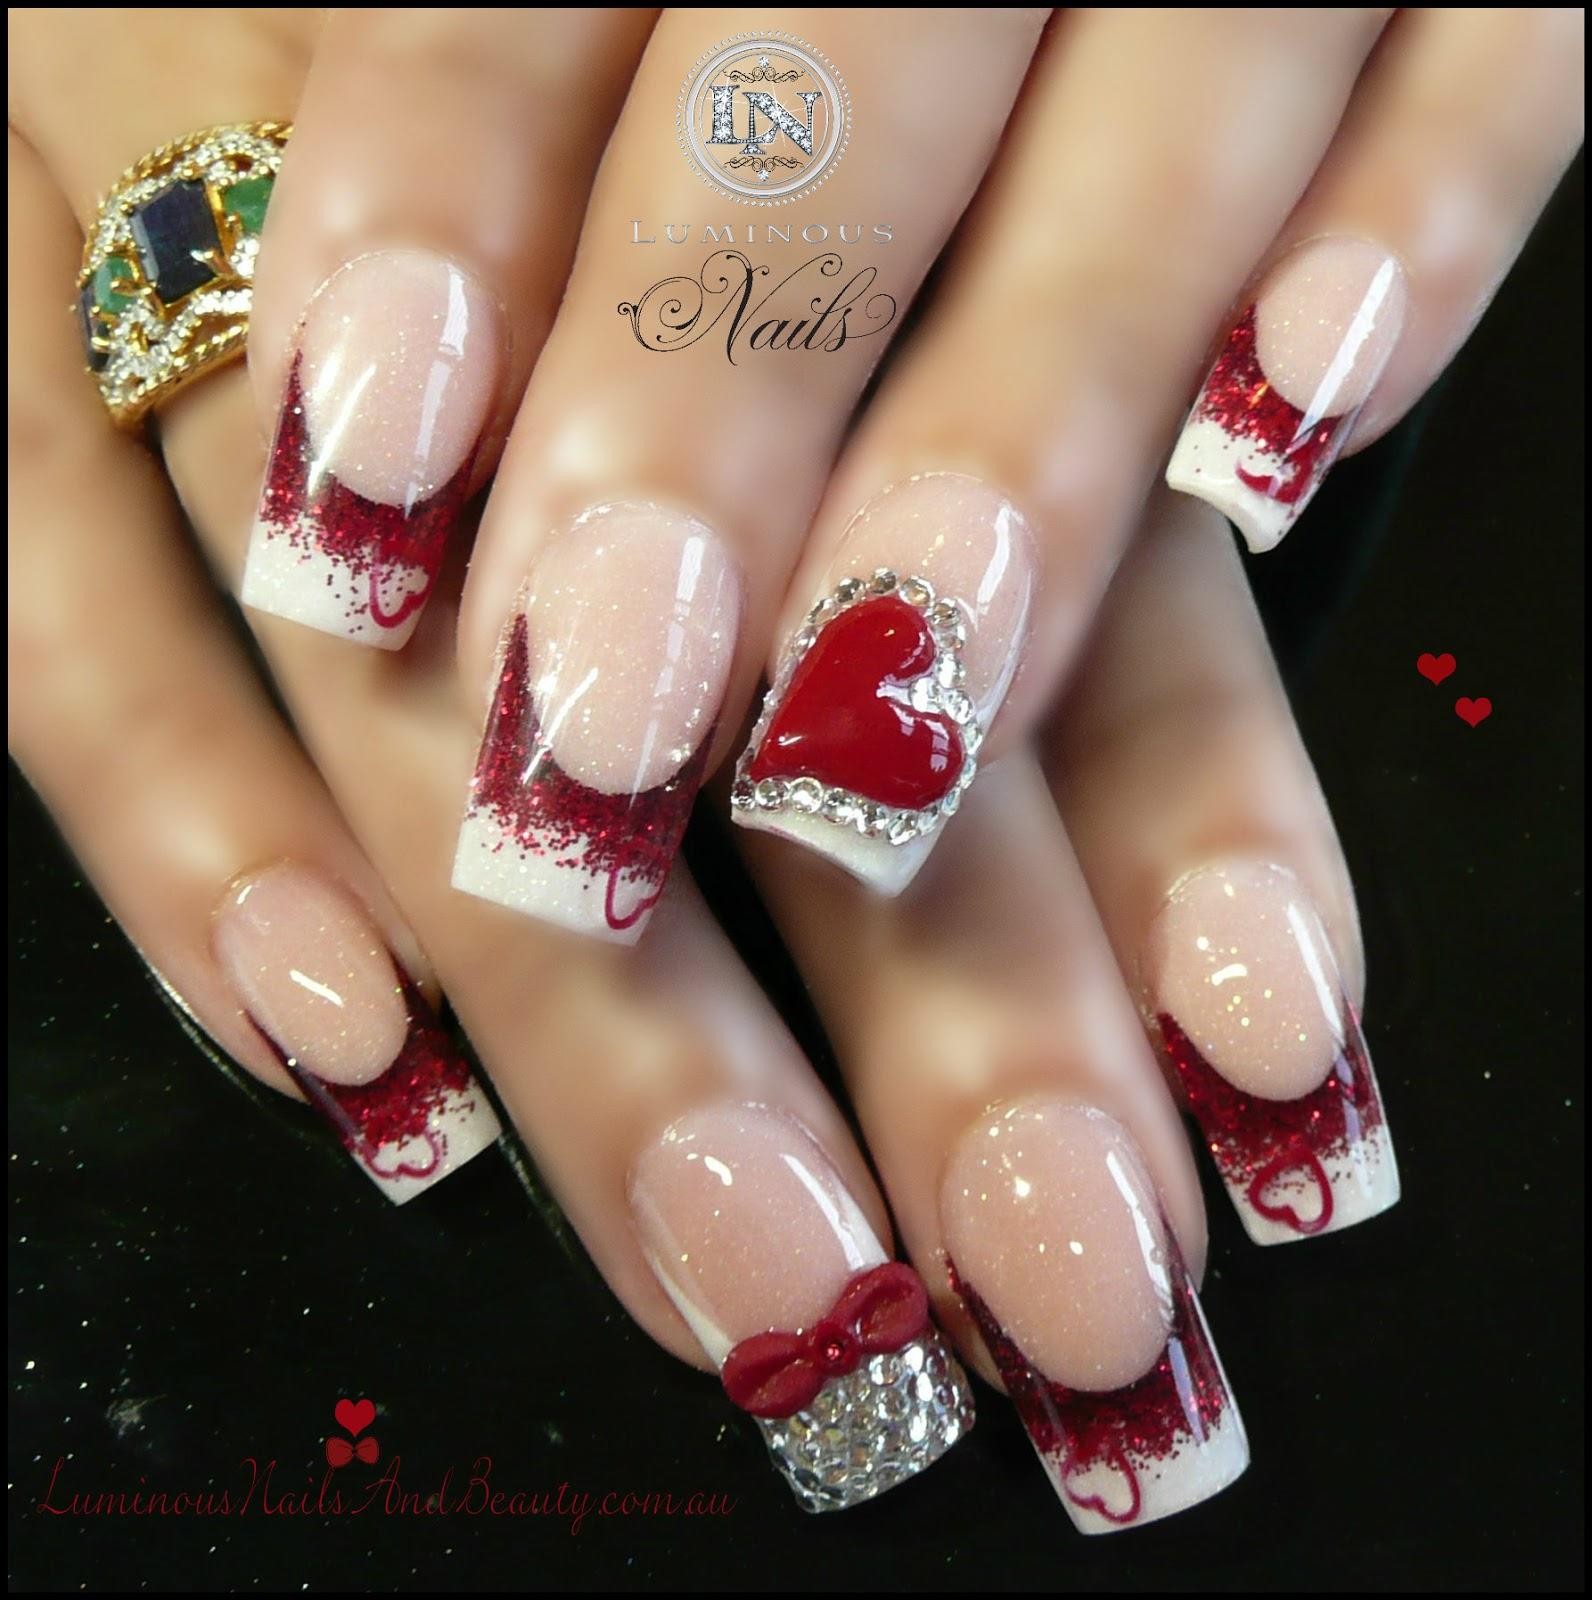 Luminous Nails: February 2013